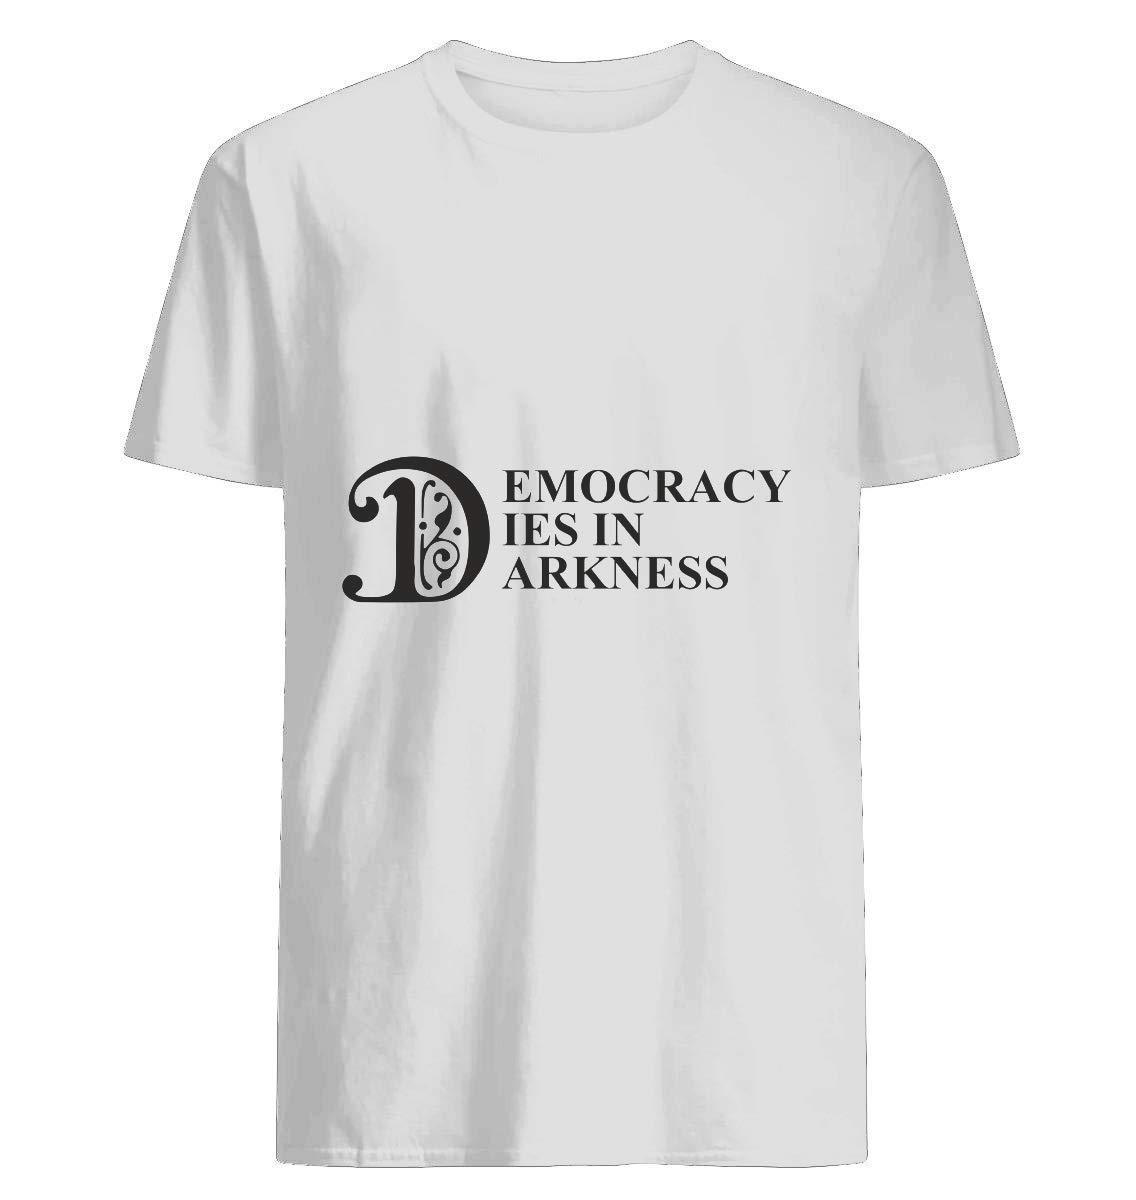 Democracy Definition In America Republic T Shirt